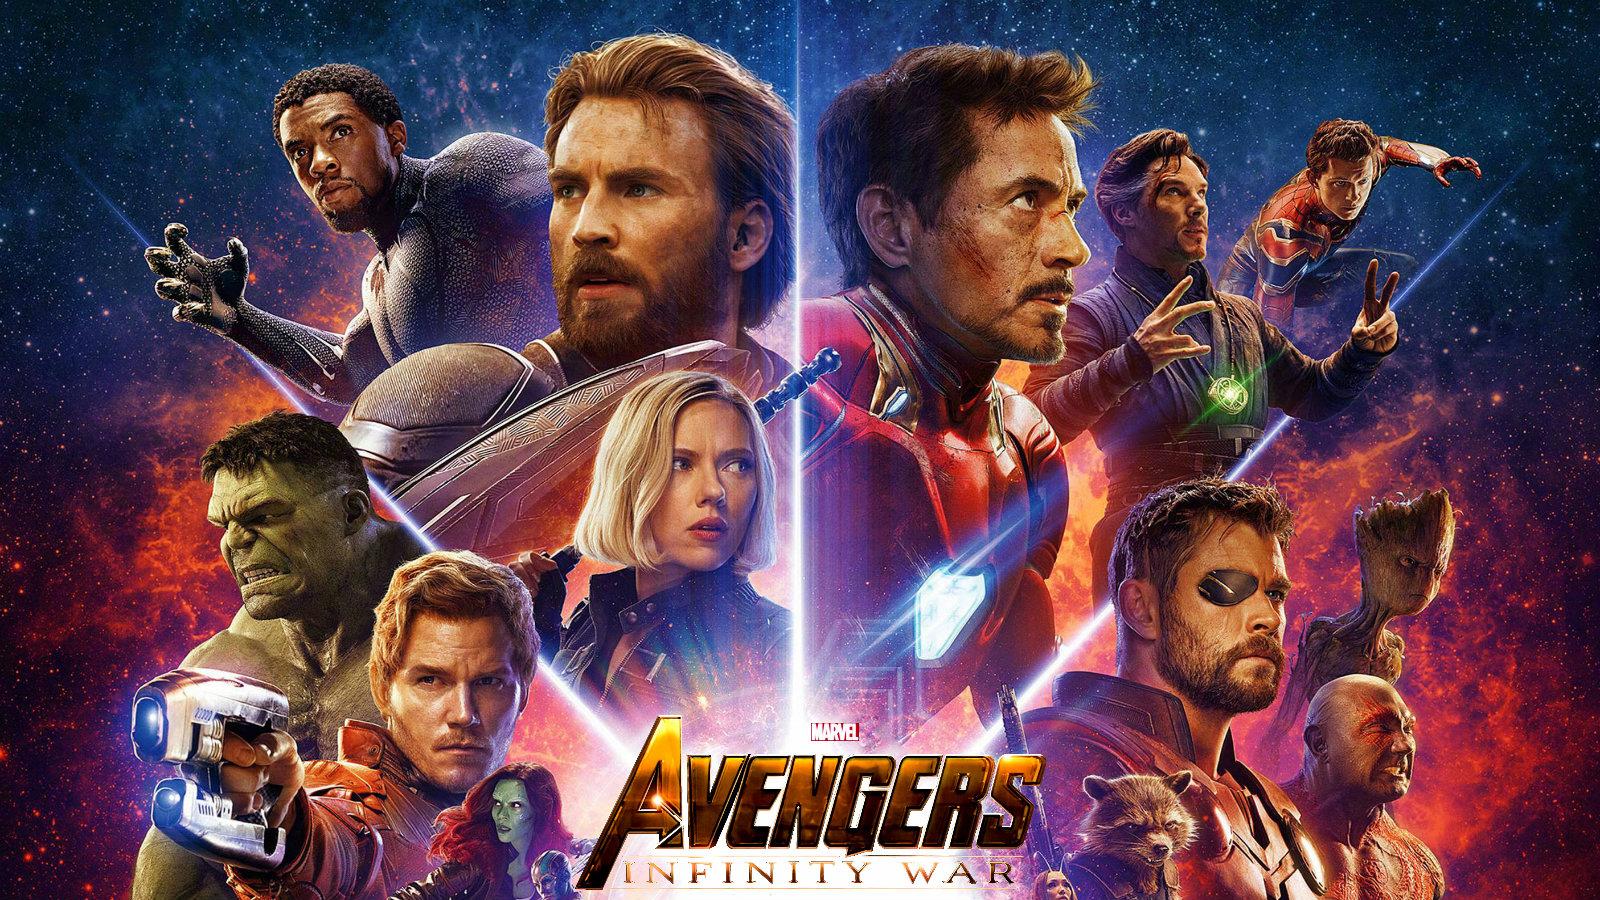 Avengers Infinity War 1 2 images Avengers Infinity War HD 1600x900